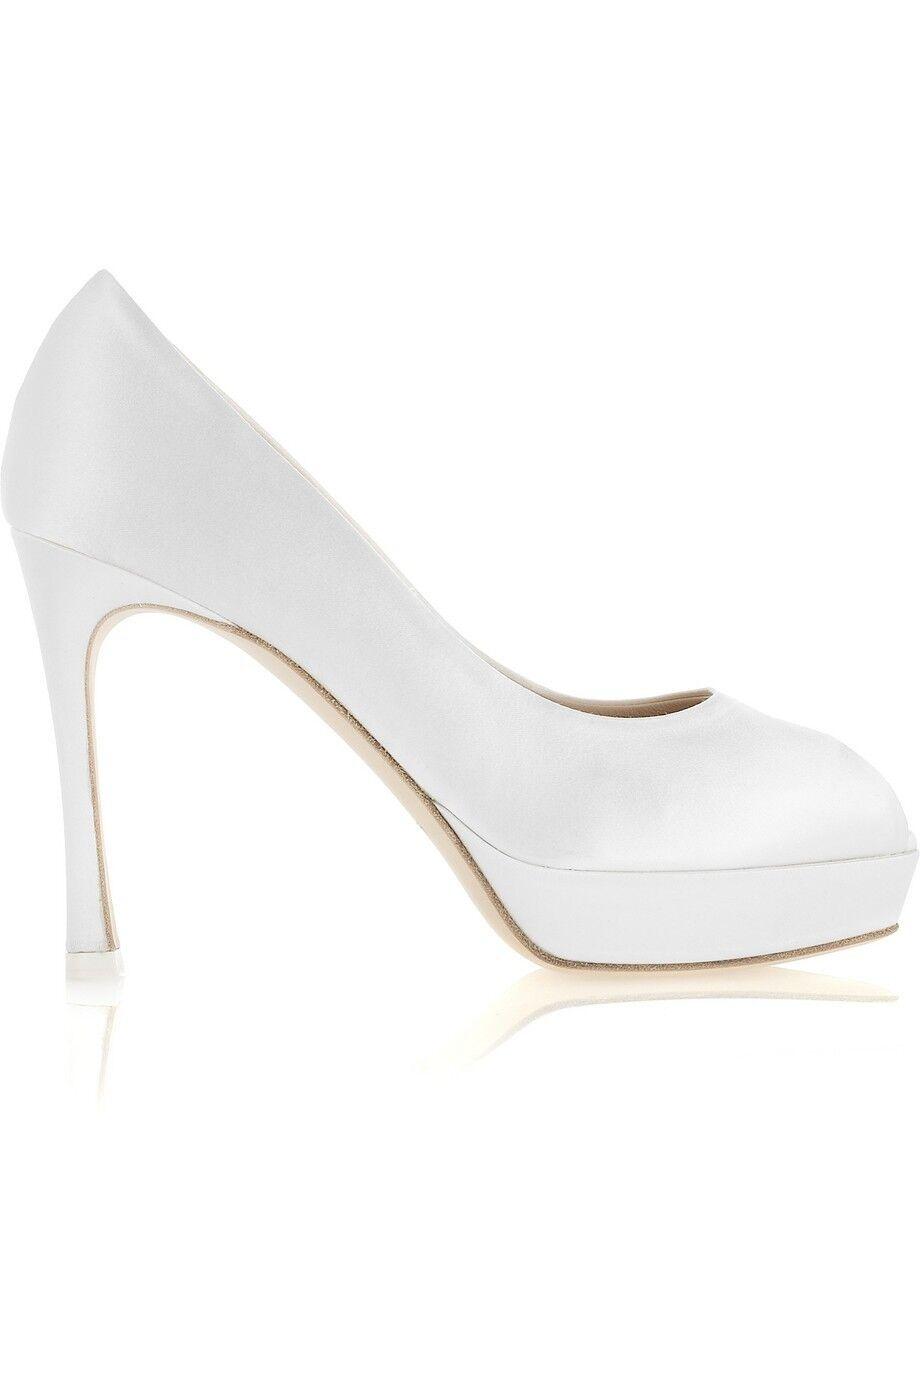 Yves Saint Laurent PALAIS SEXY Perfect Wedding EU 40.5 41.5 I LOVE SCARPE